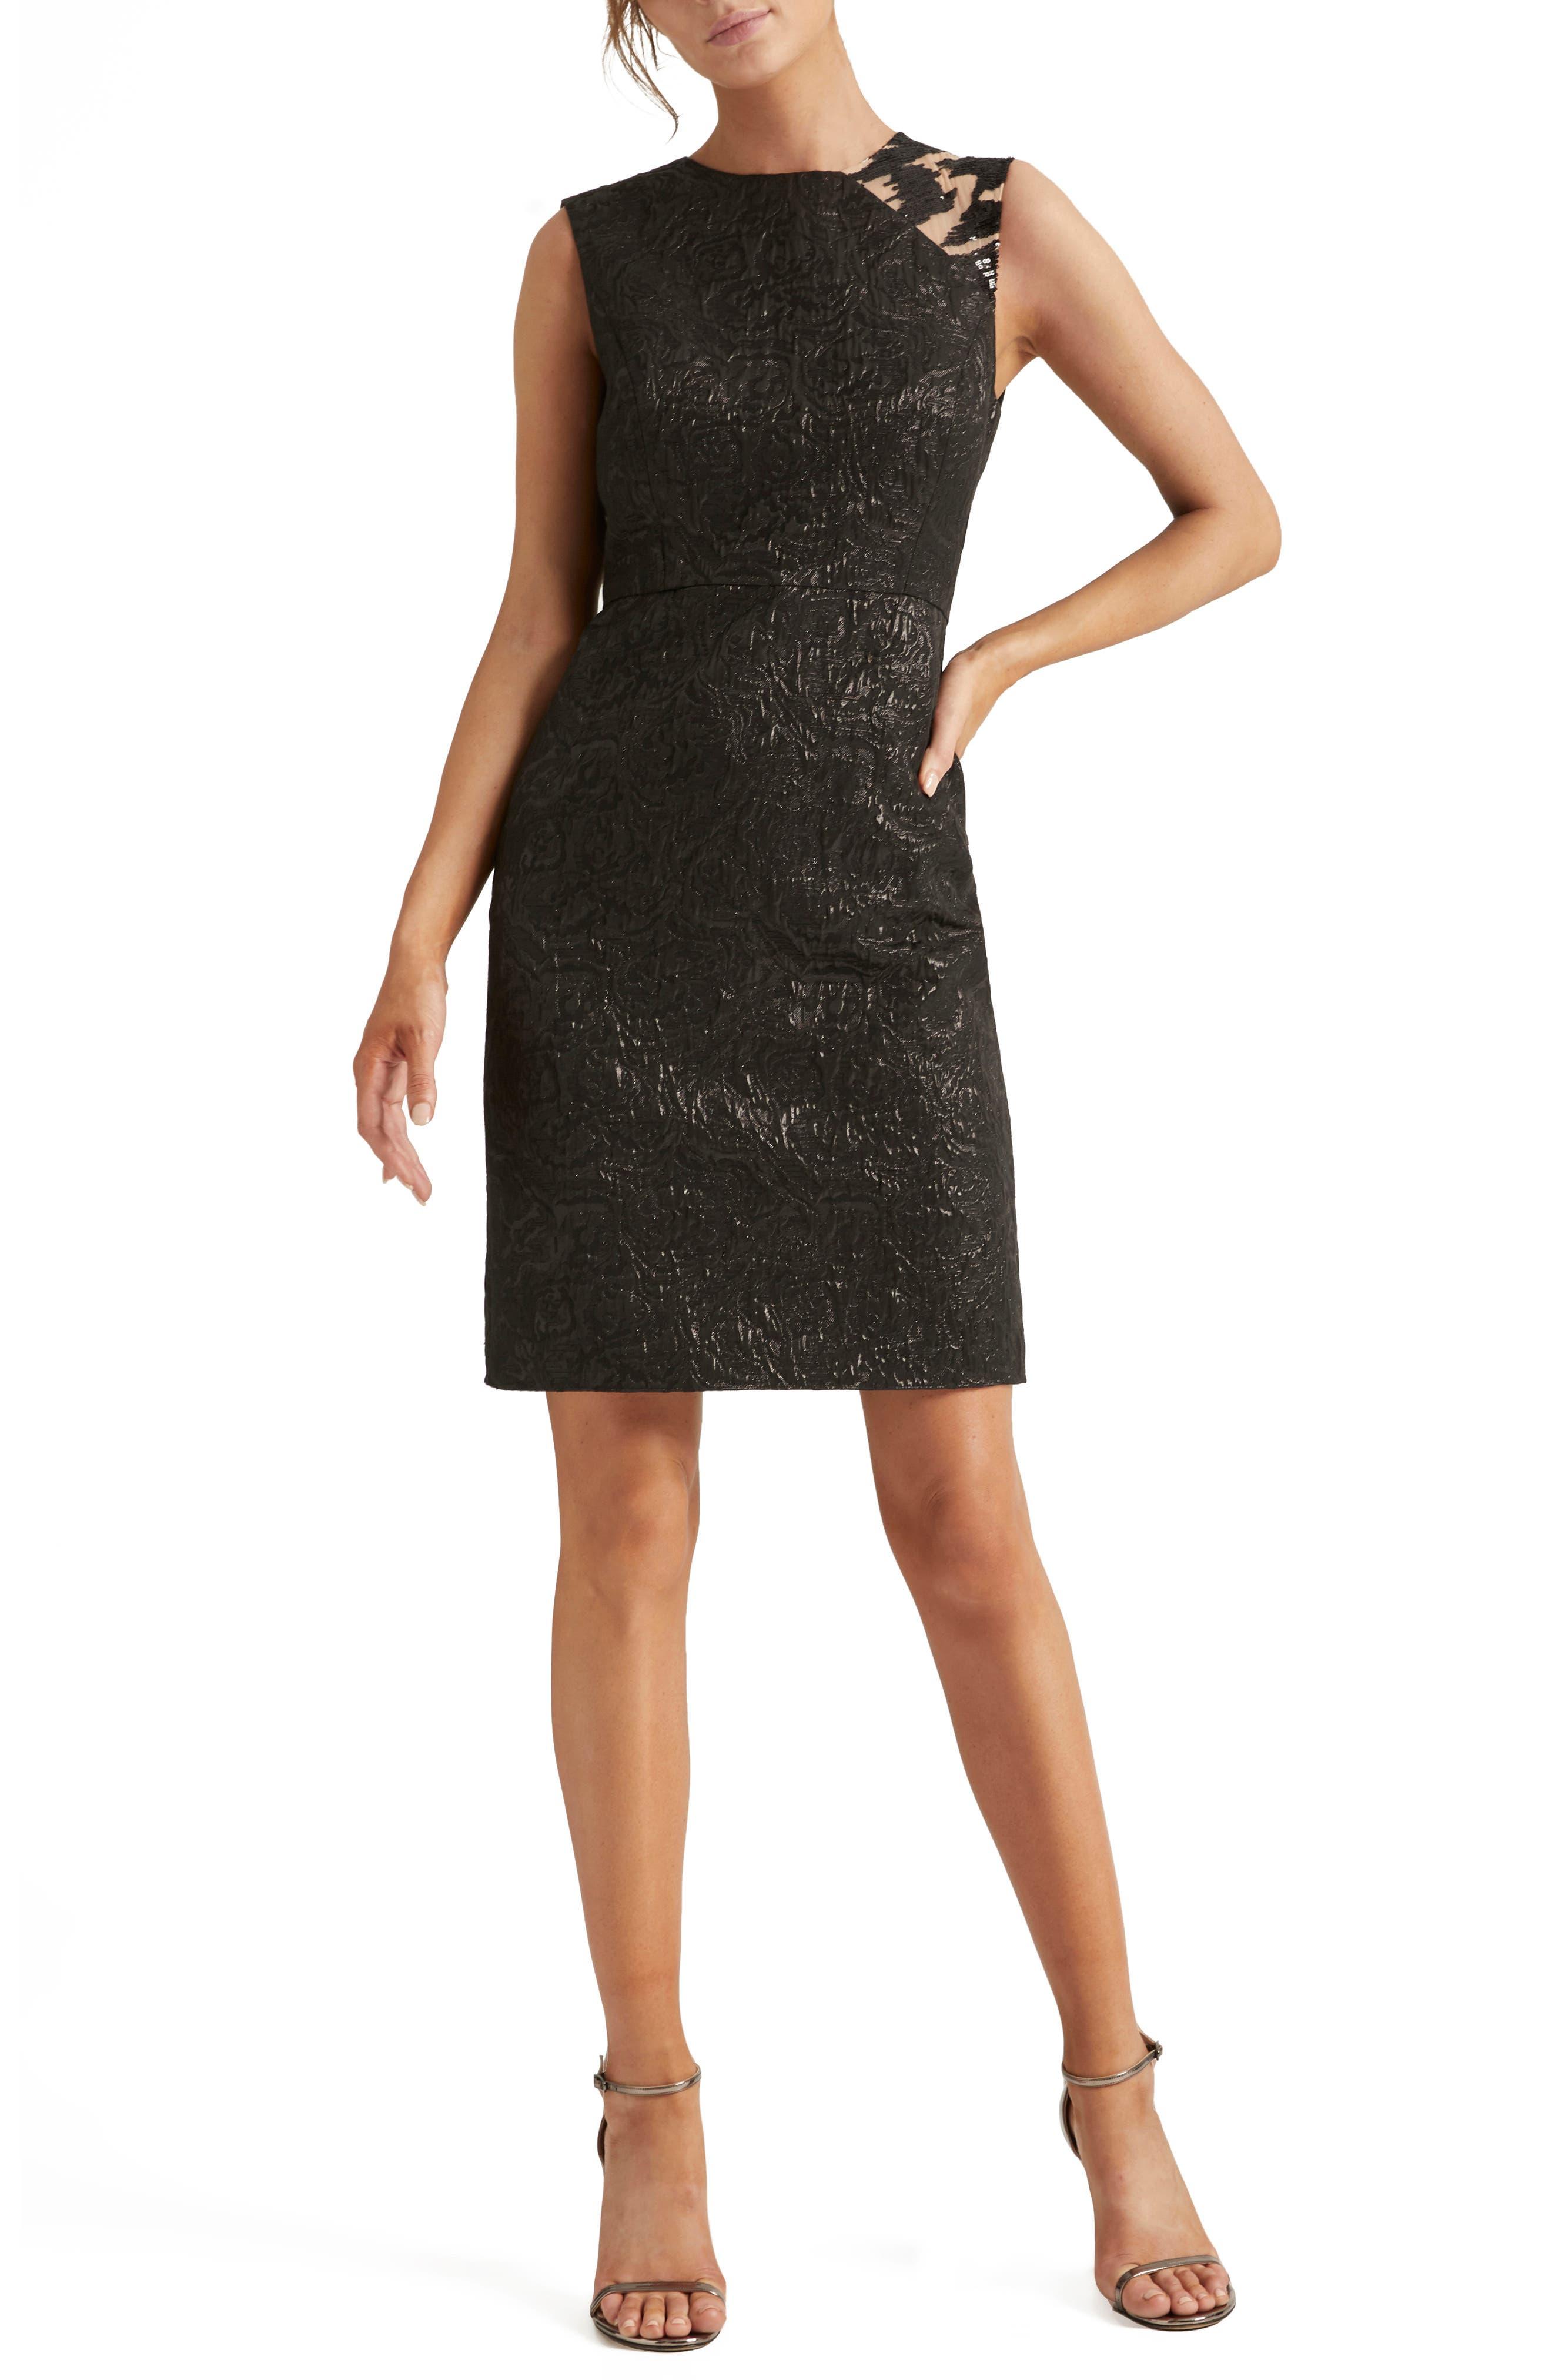 Jacquard Embellished Dress